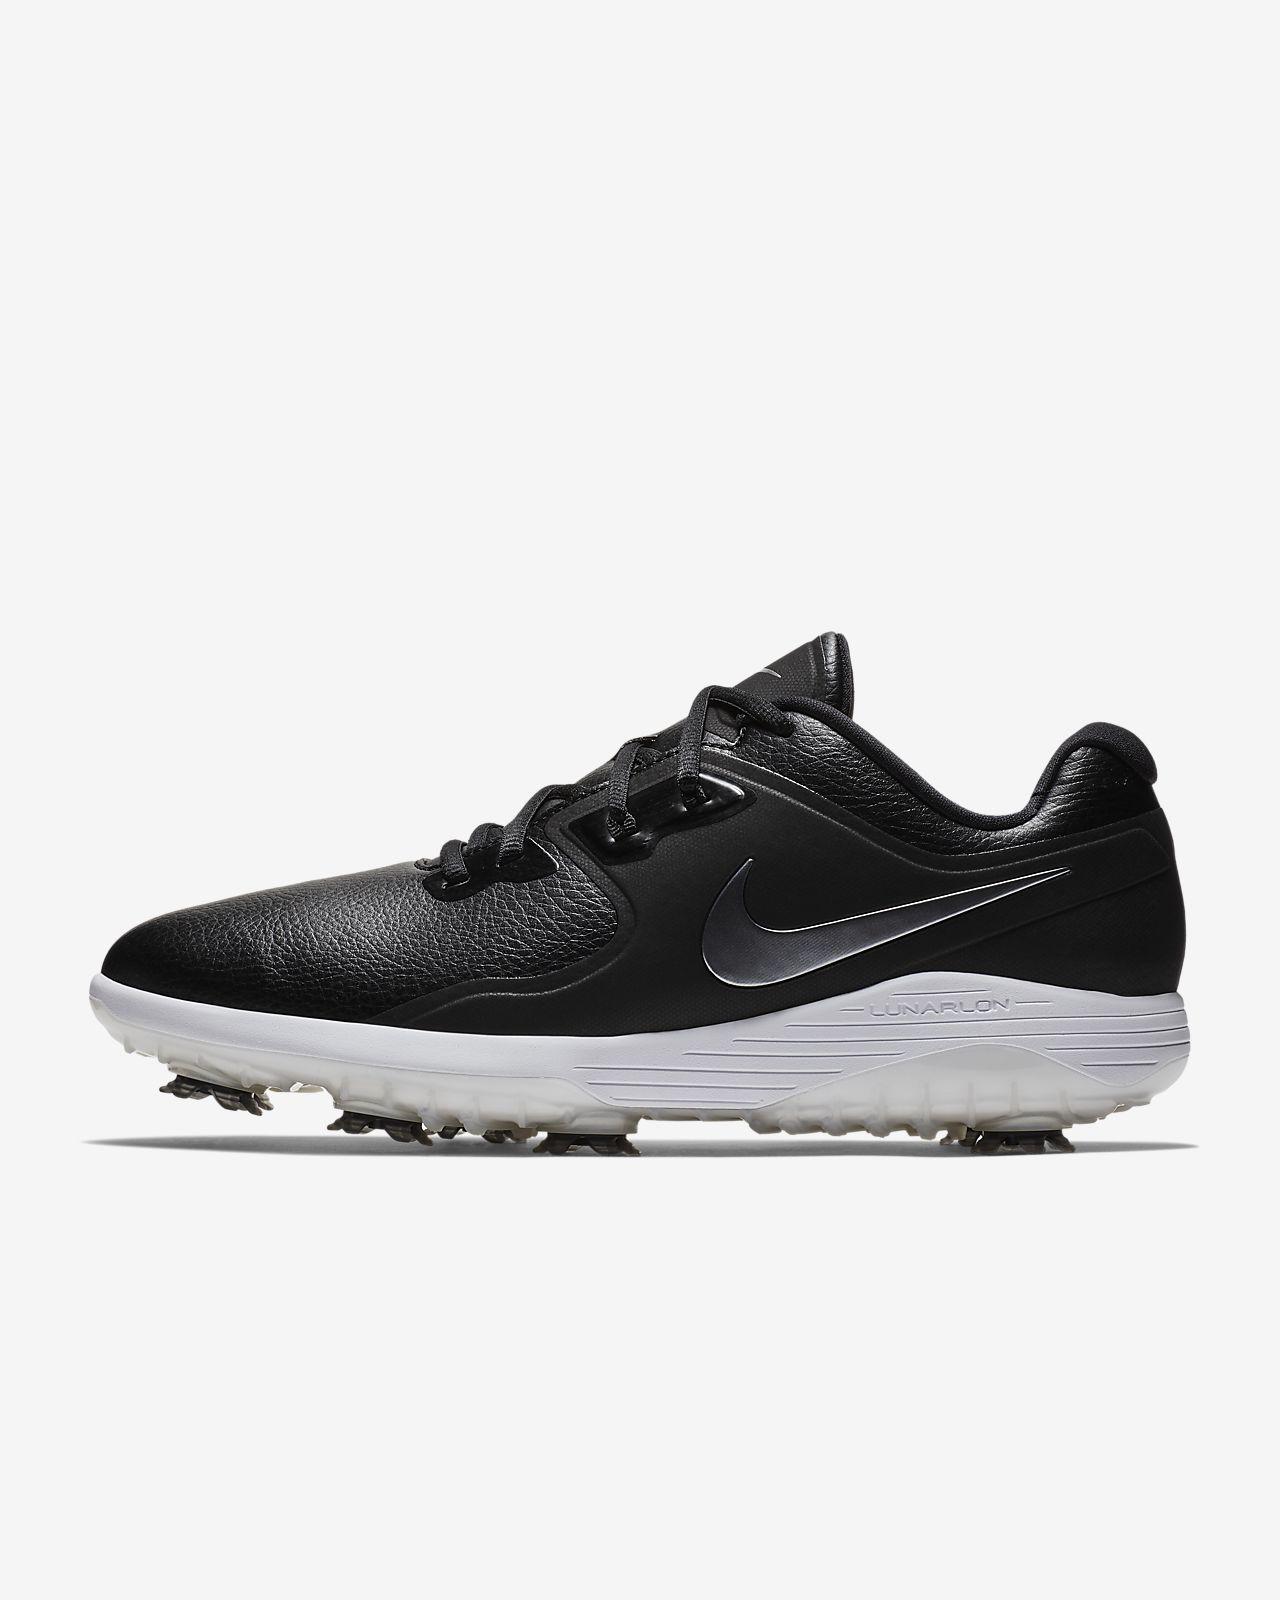 3eabe3620aa Nike Vapor Pro Men s Golf Shoe. Nike.com GB